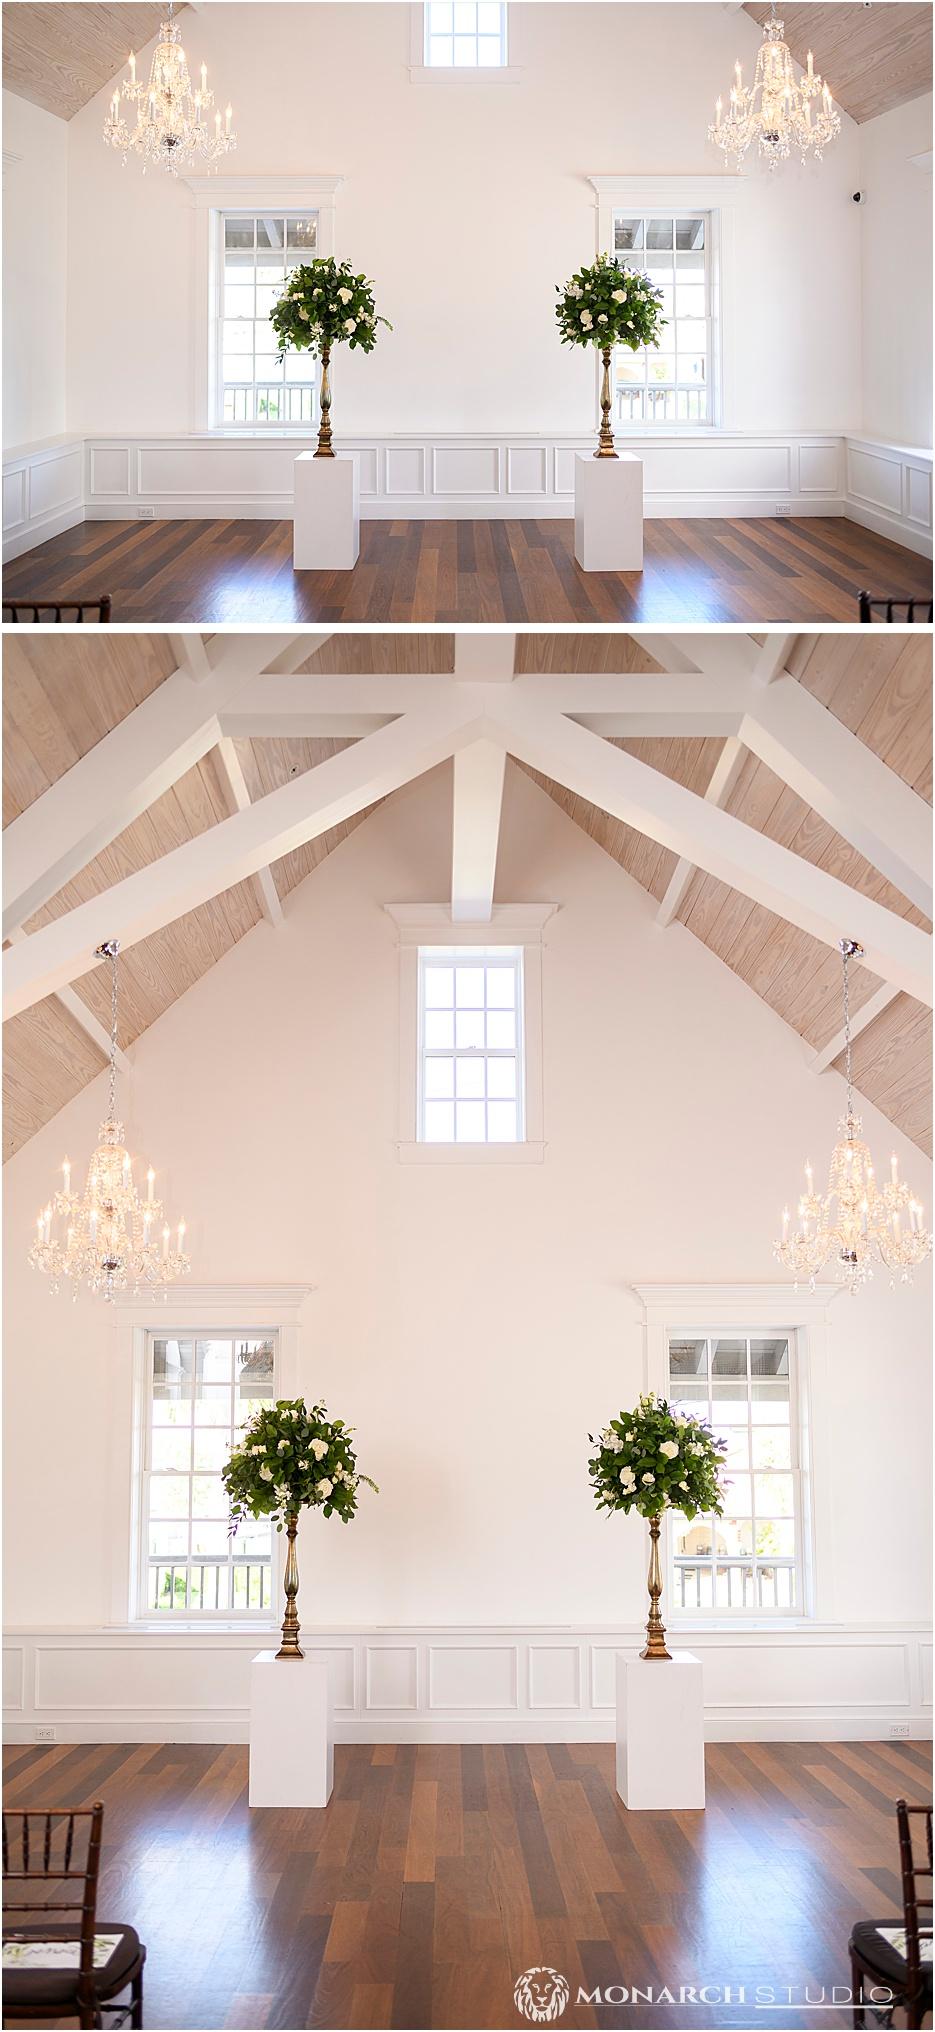 060-whiteroom-wedding-photographer-2019-05-22_0042.jpg